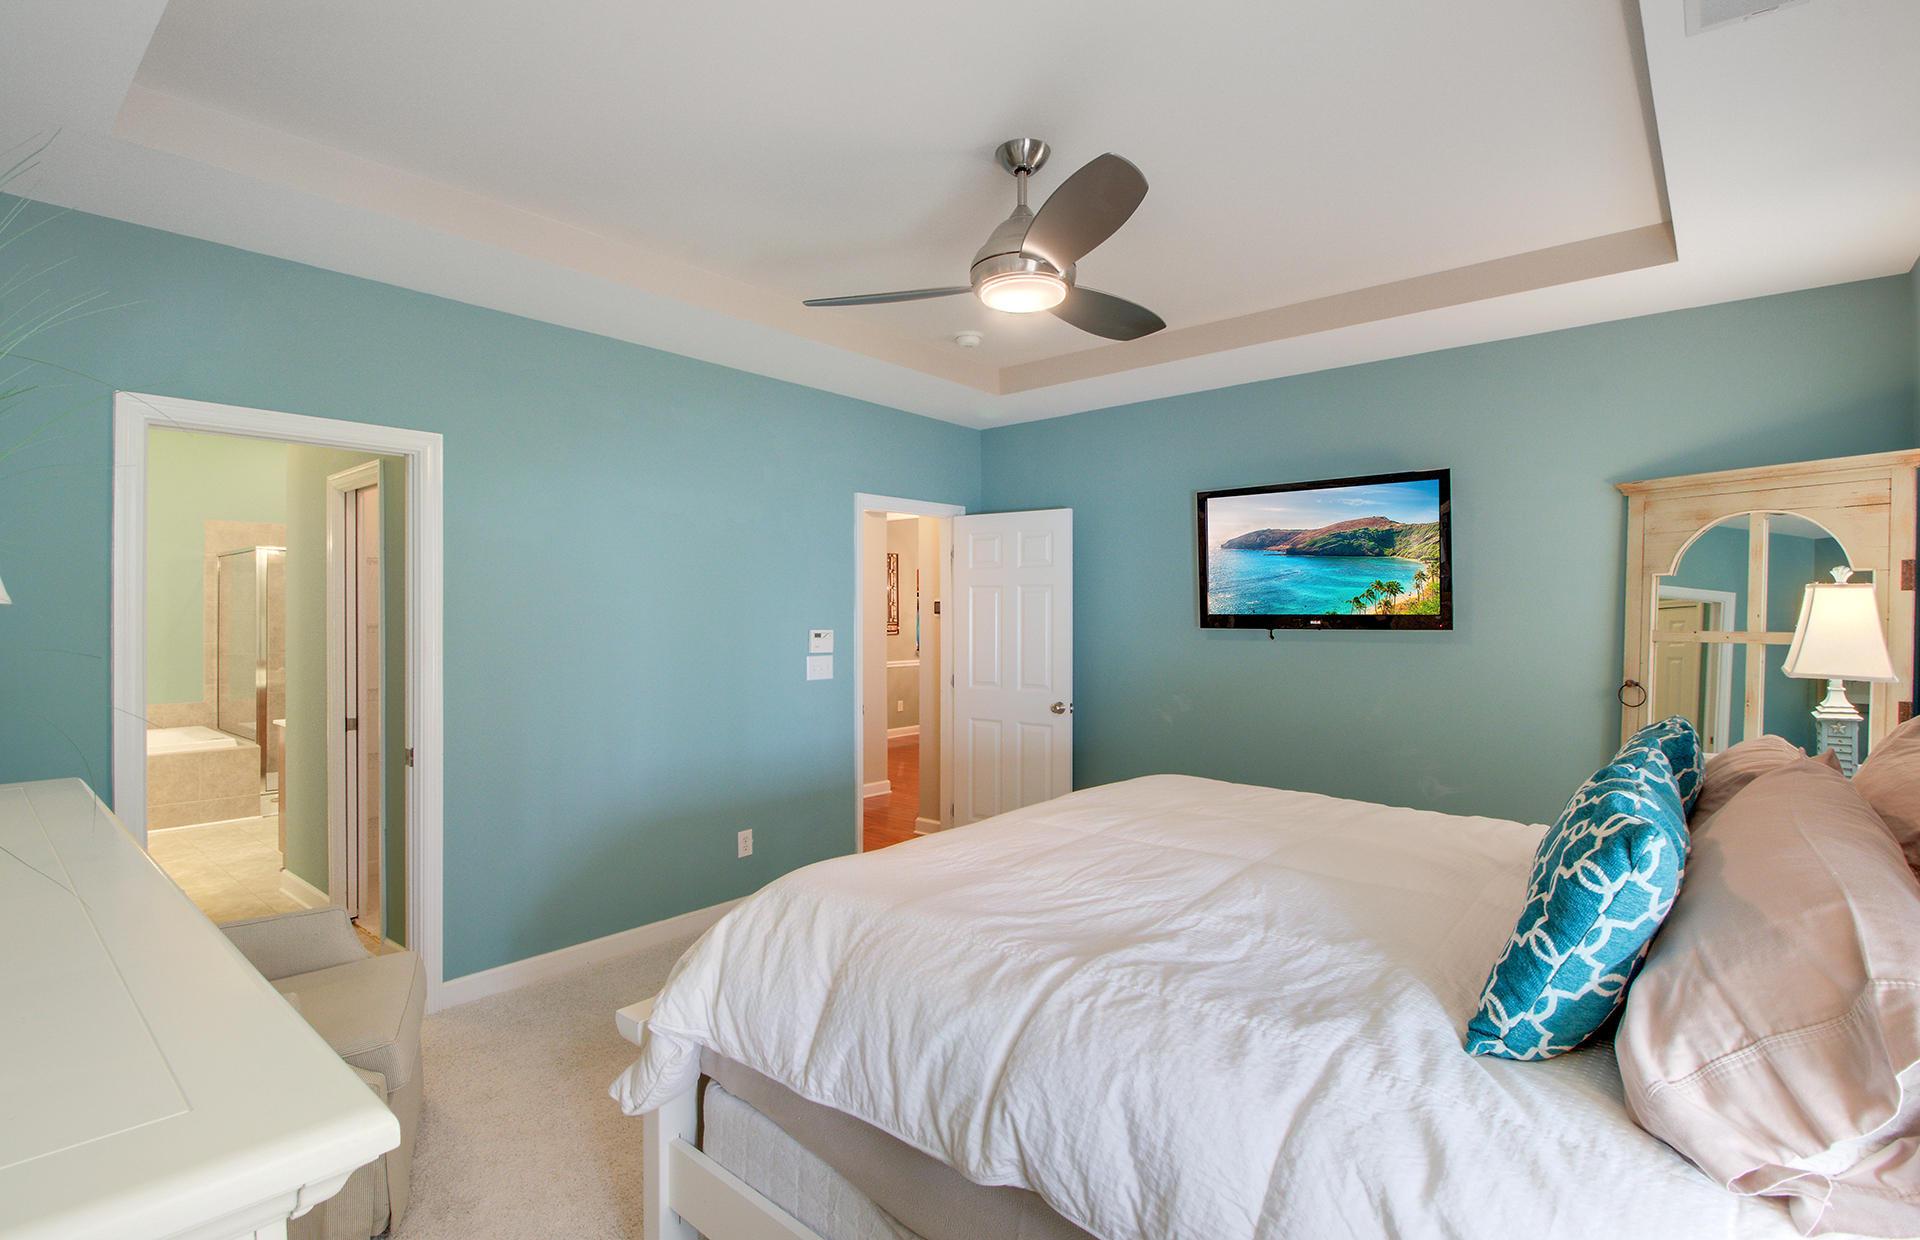 Dunes West Homes For Sale - 145 Fresh Meadow, Mount Pleasant, SC - 21